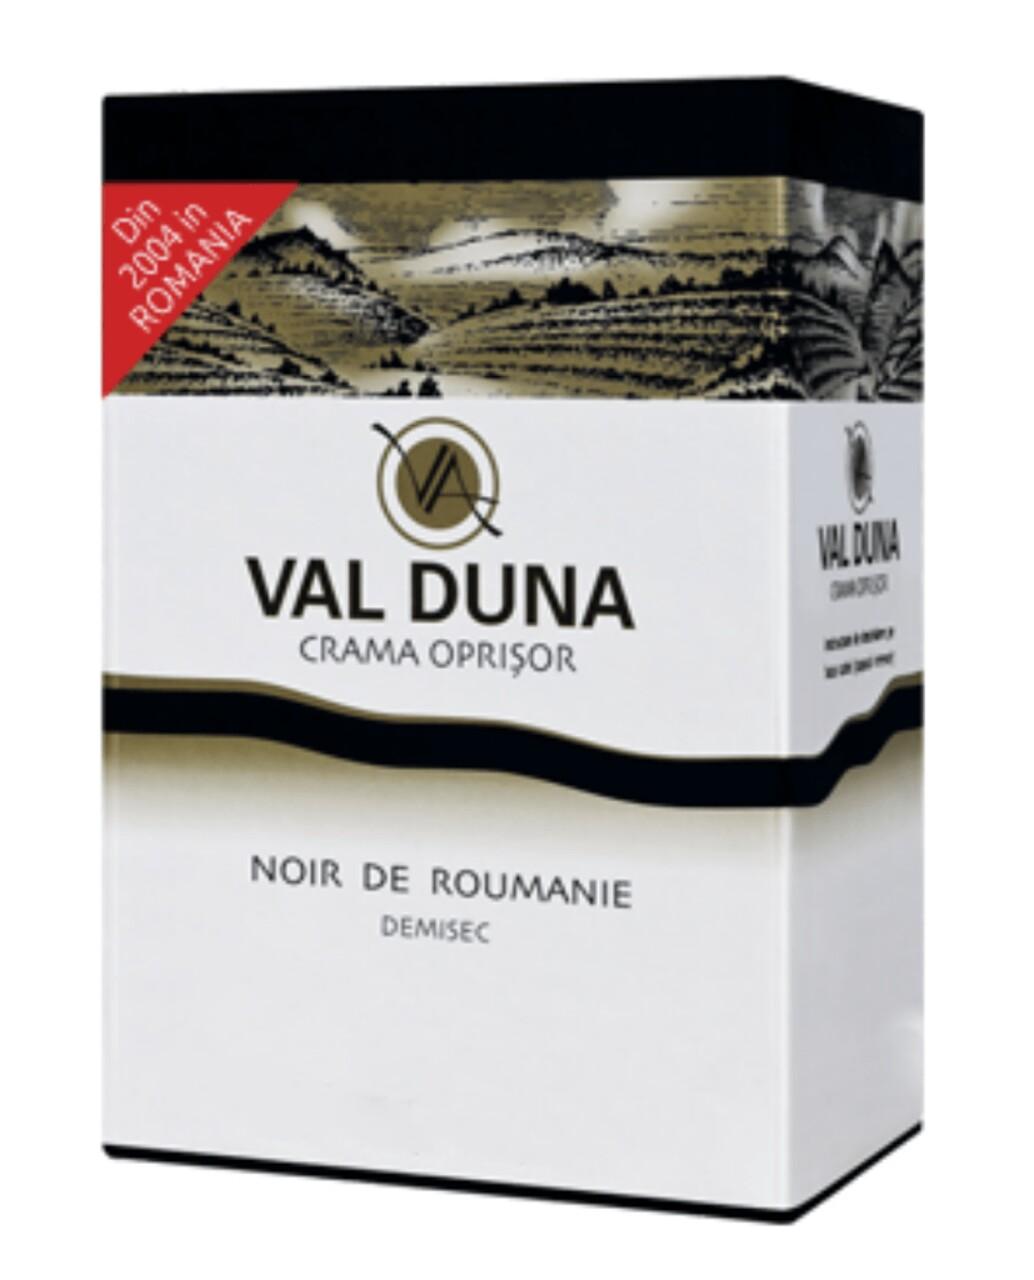 Oprisor Val Duna Noir de Roumanie BIB 3L